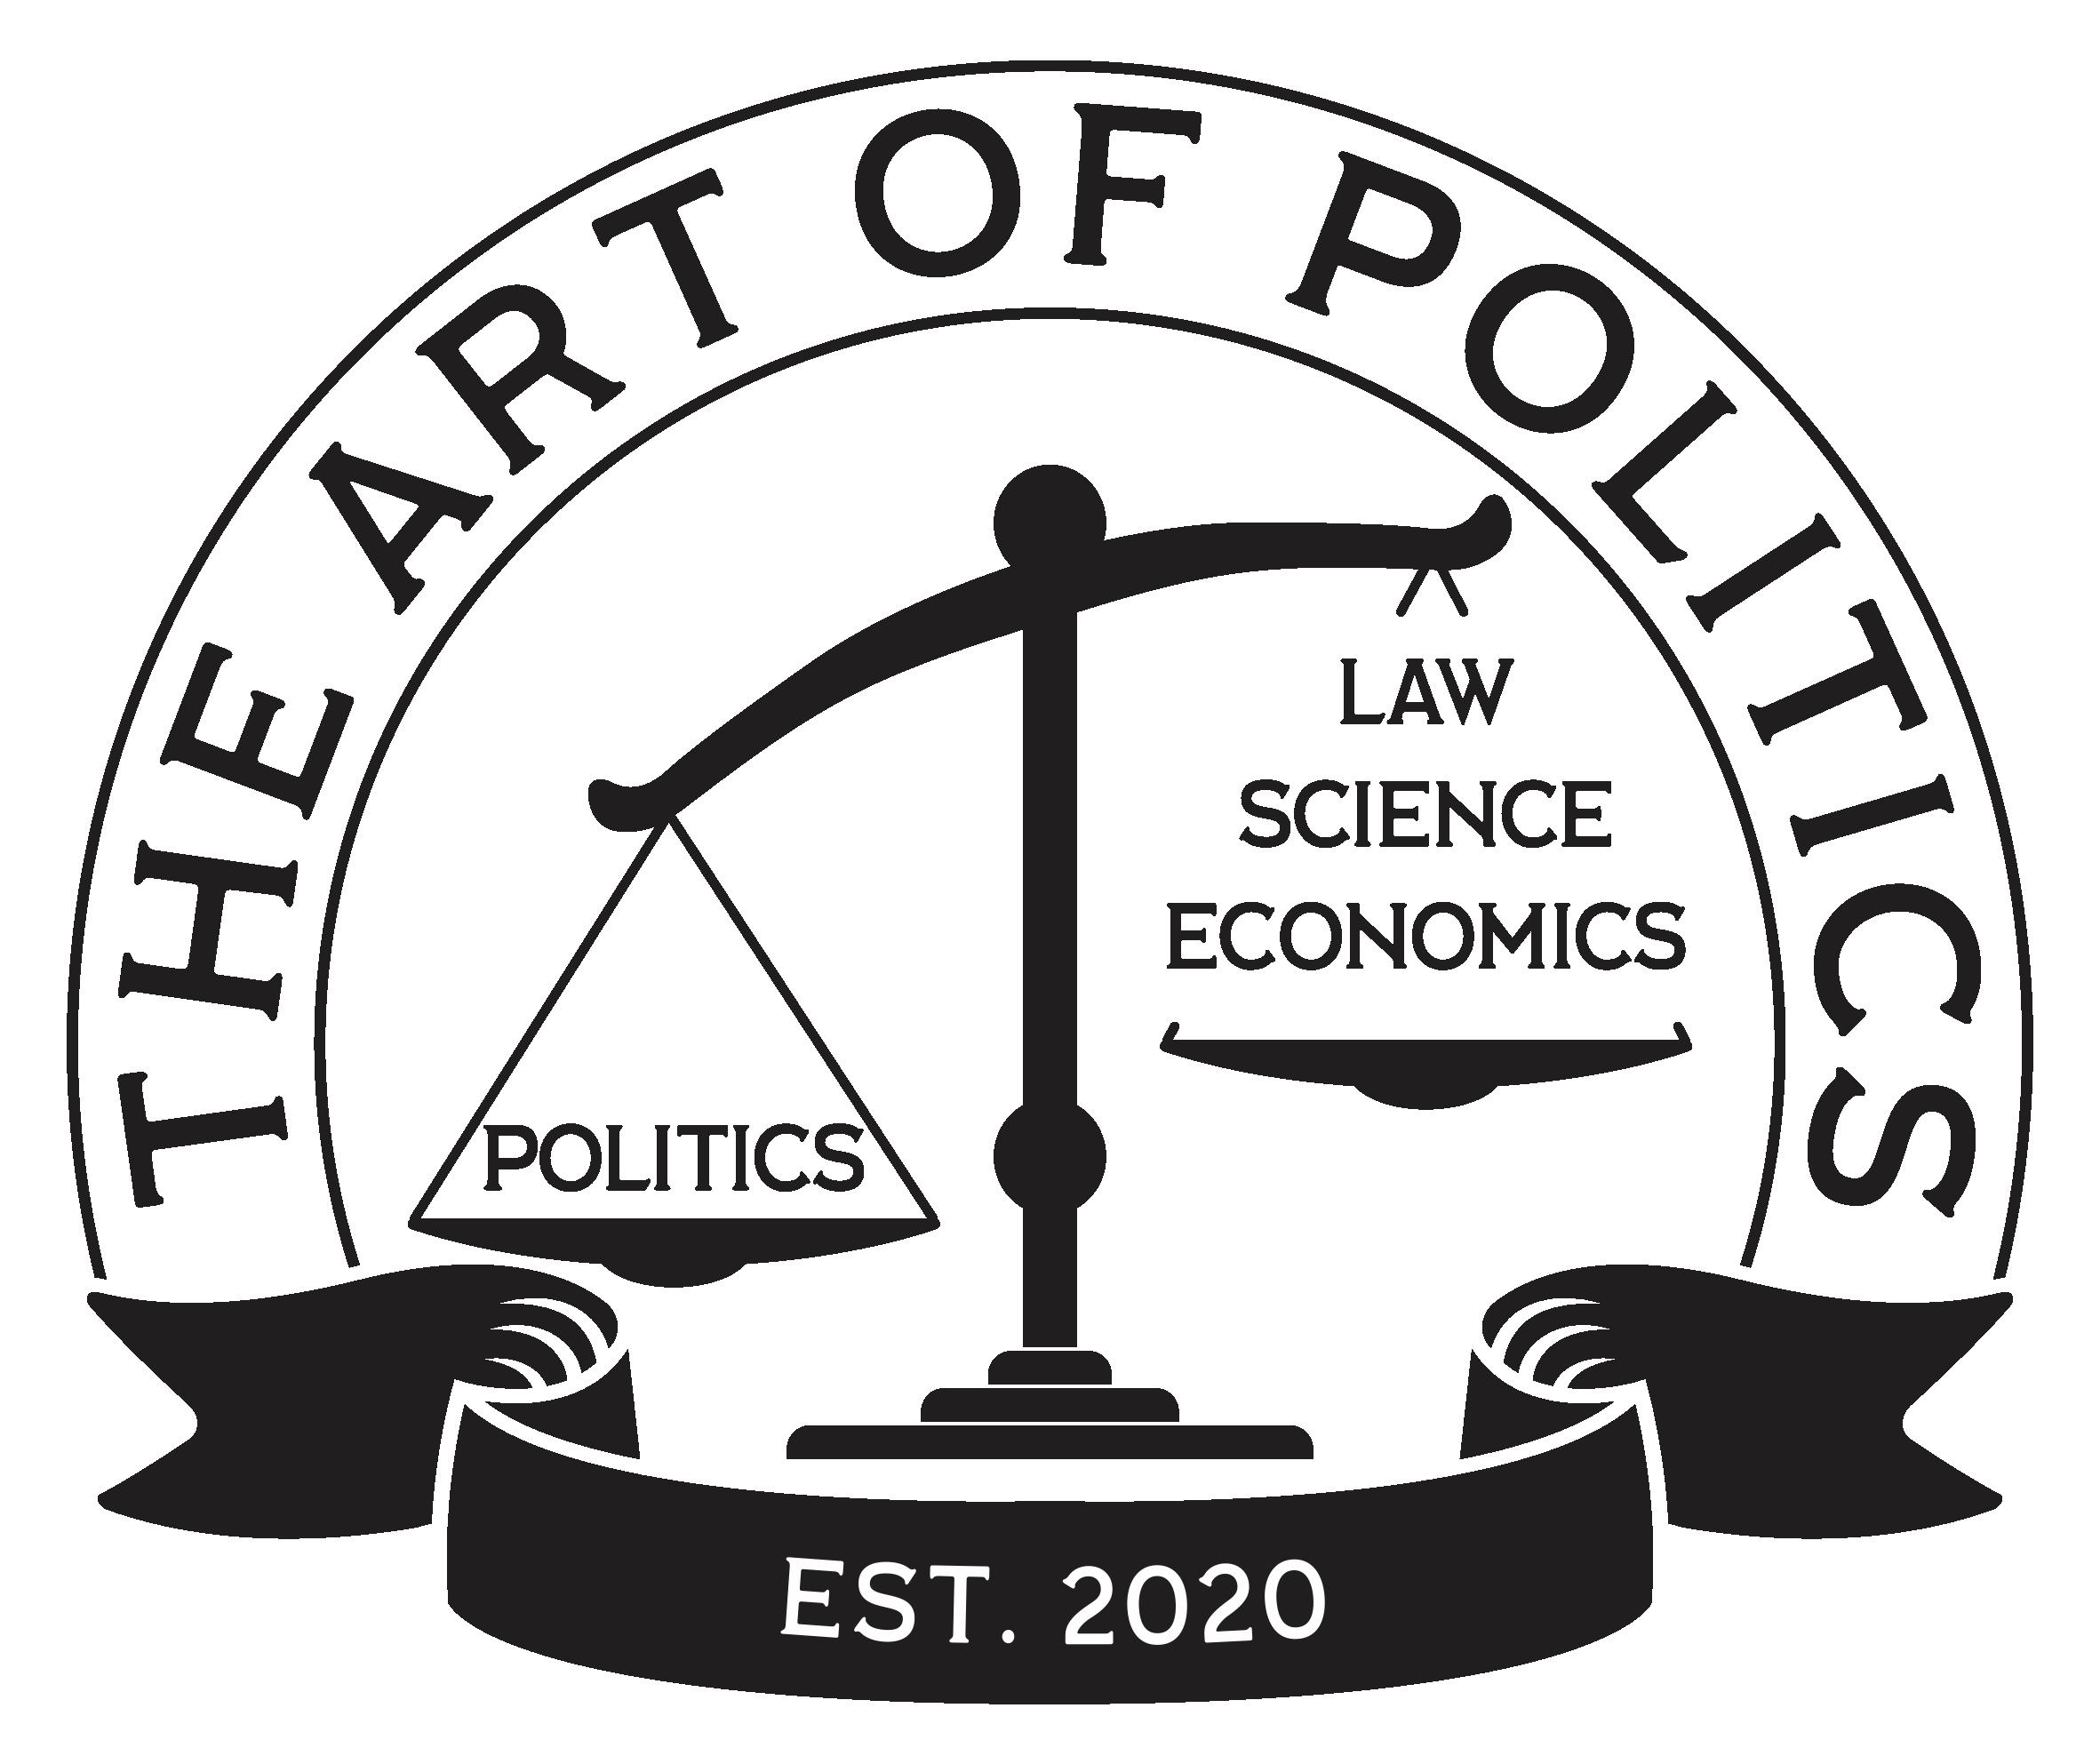 The Art Of Politics